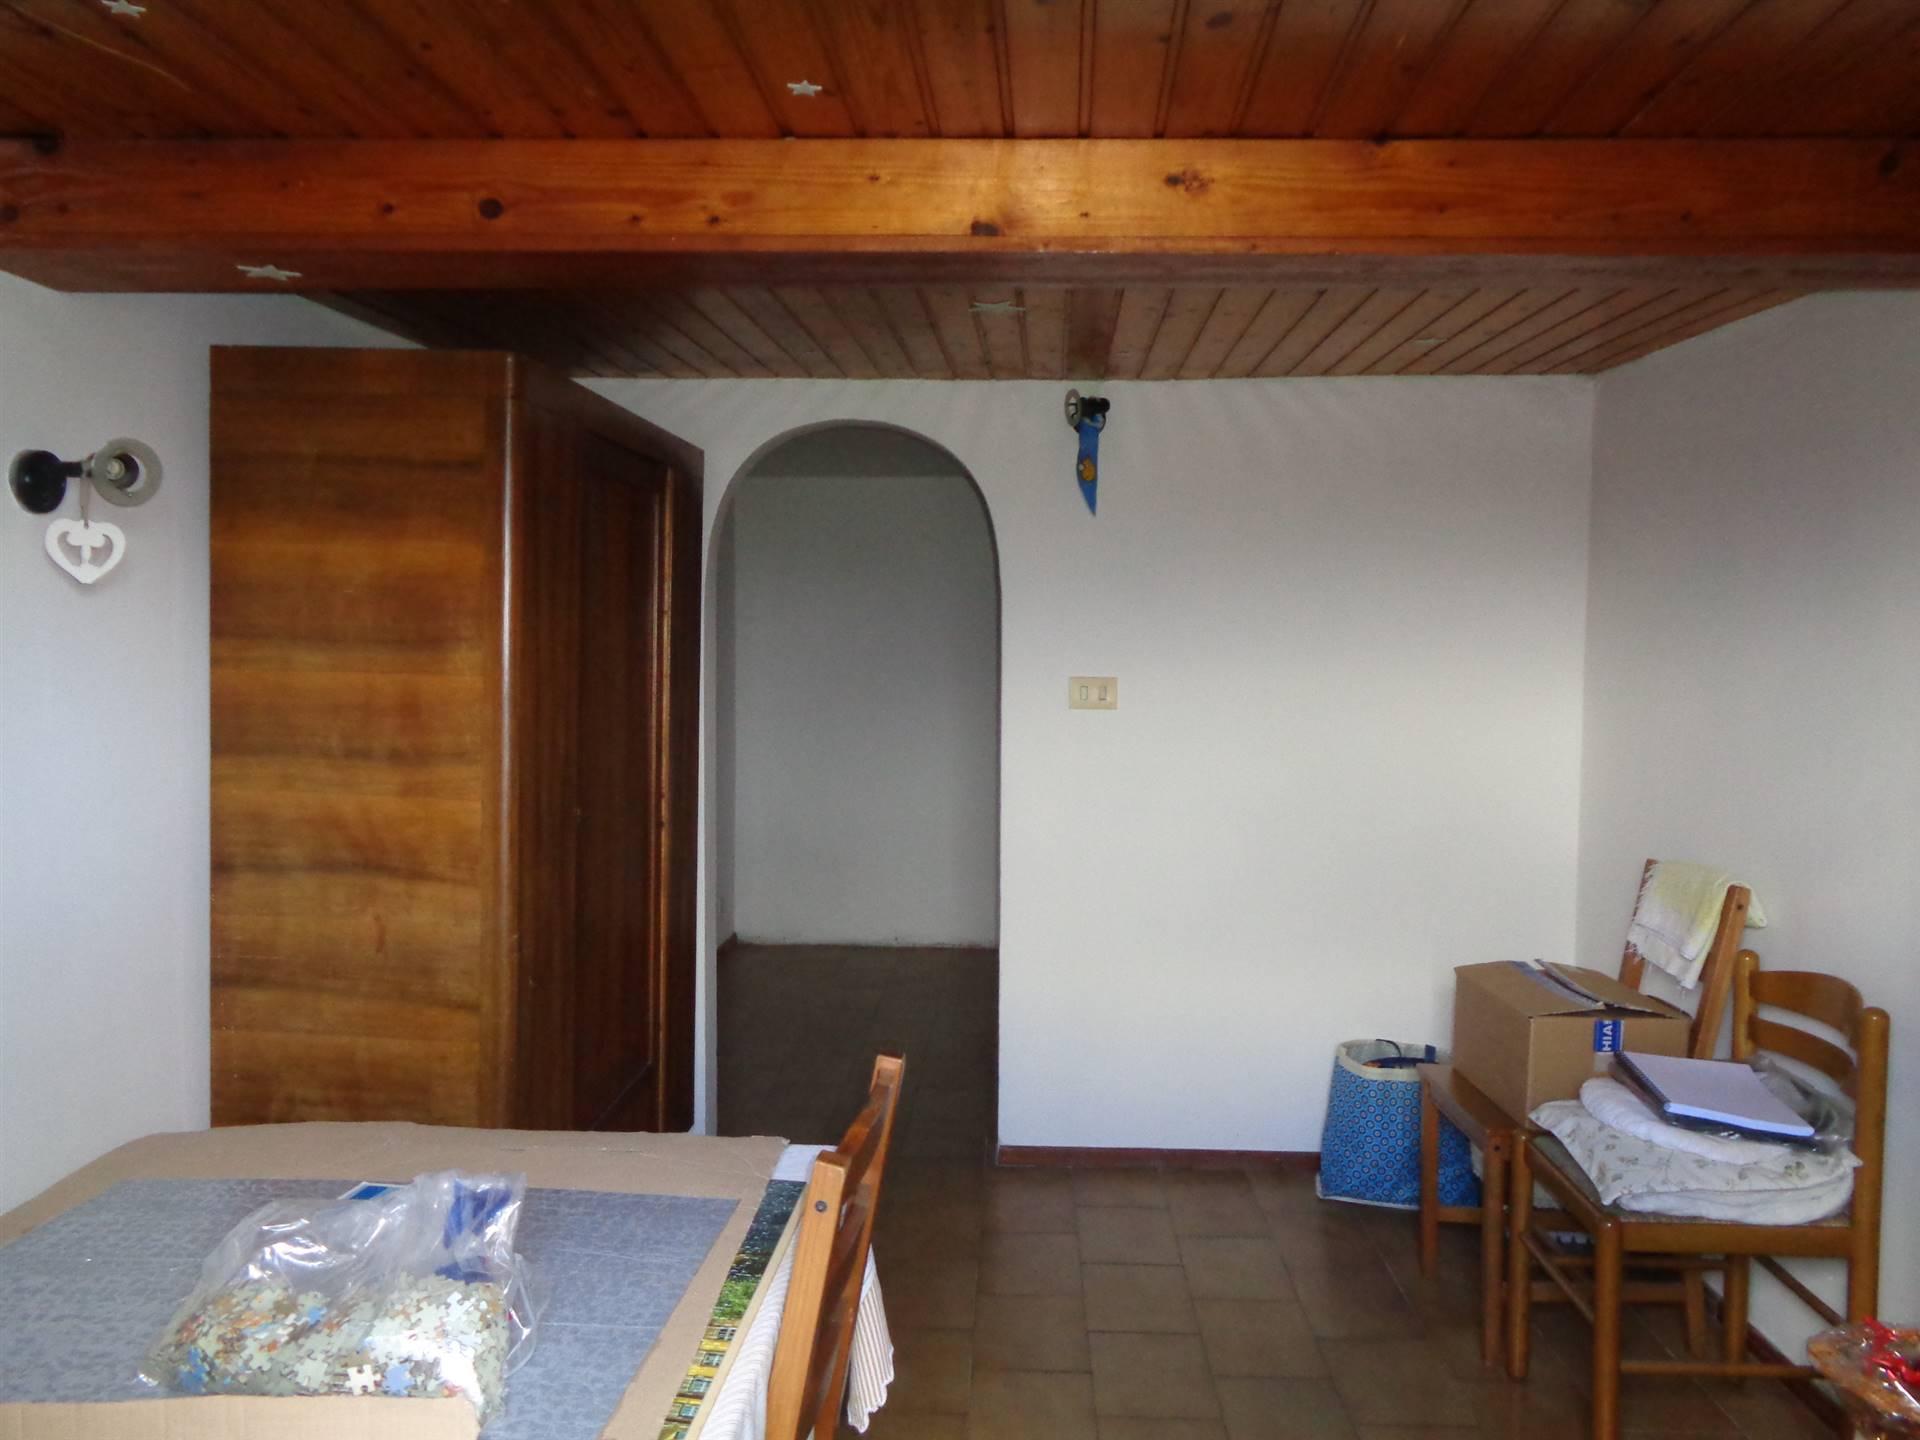 Appartamento residenziale in  vendita a MONTEORIOLO › IMPRUNETA (FI)